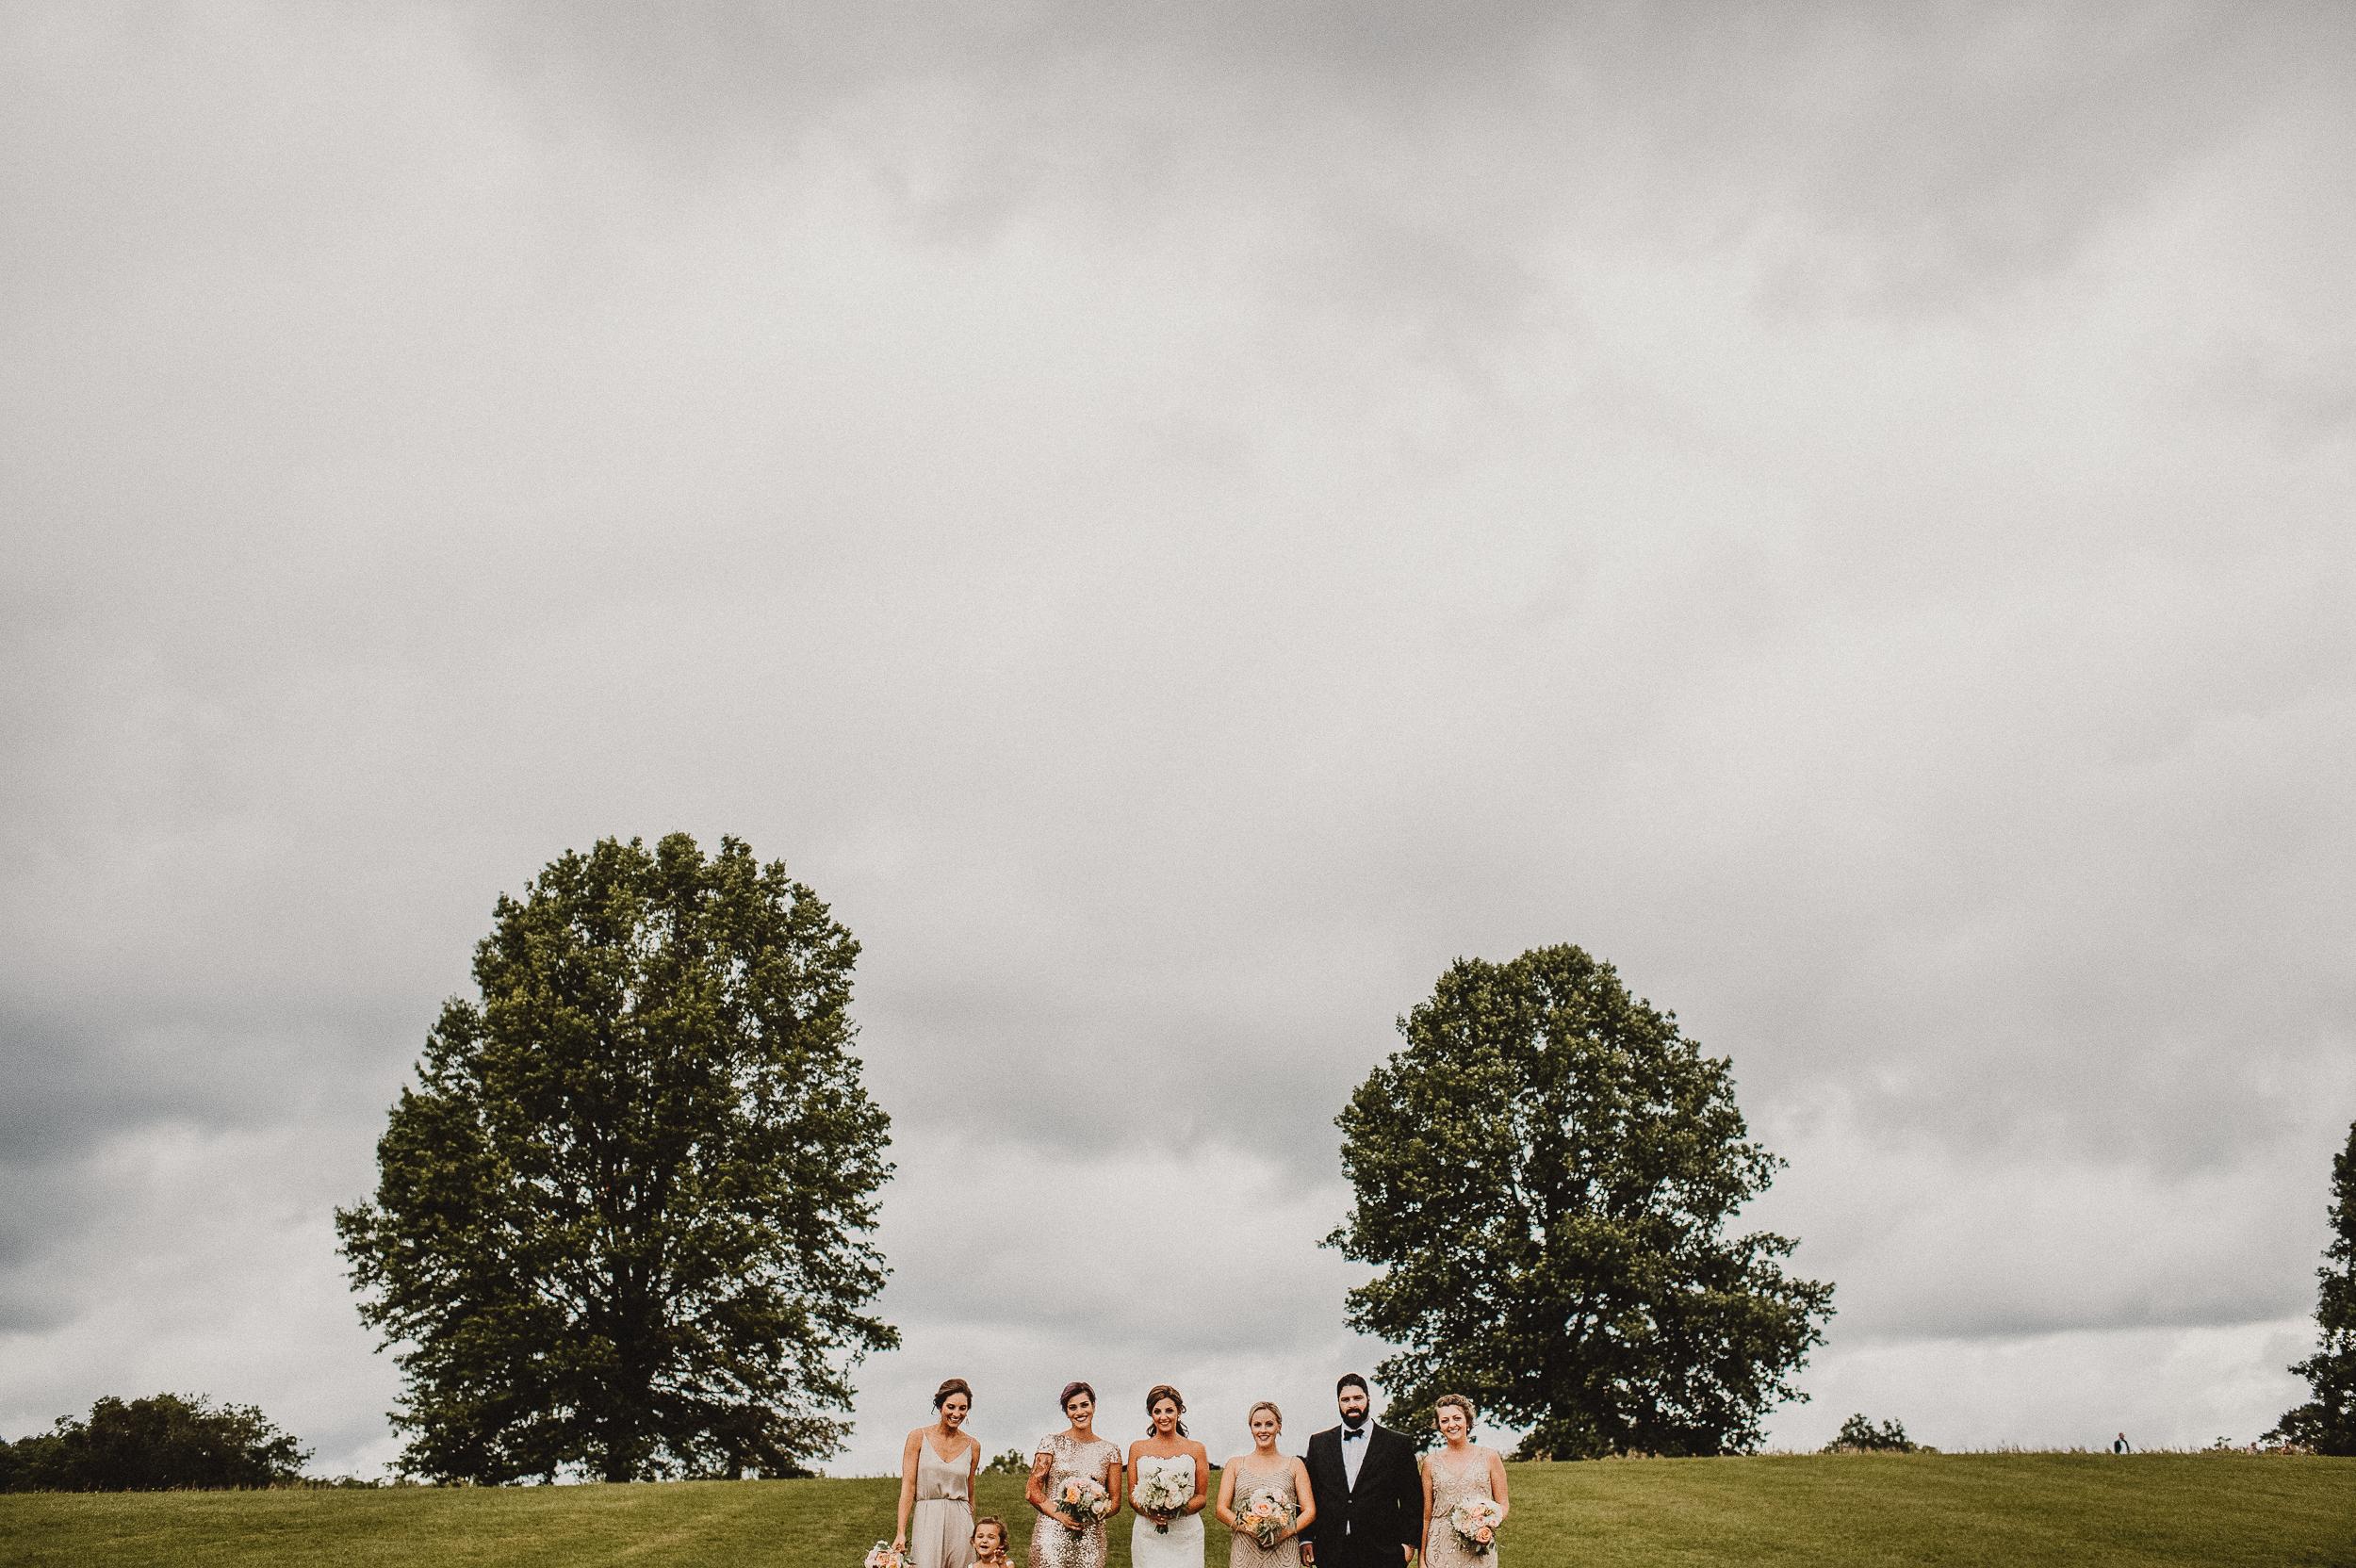 delaware-estate-wedding-photographer-pat-robinson-photography-54.jpg